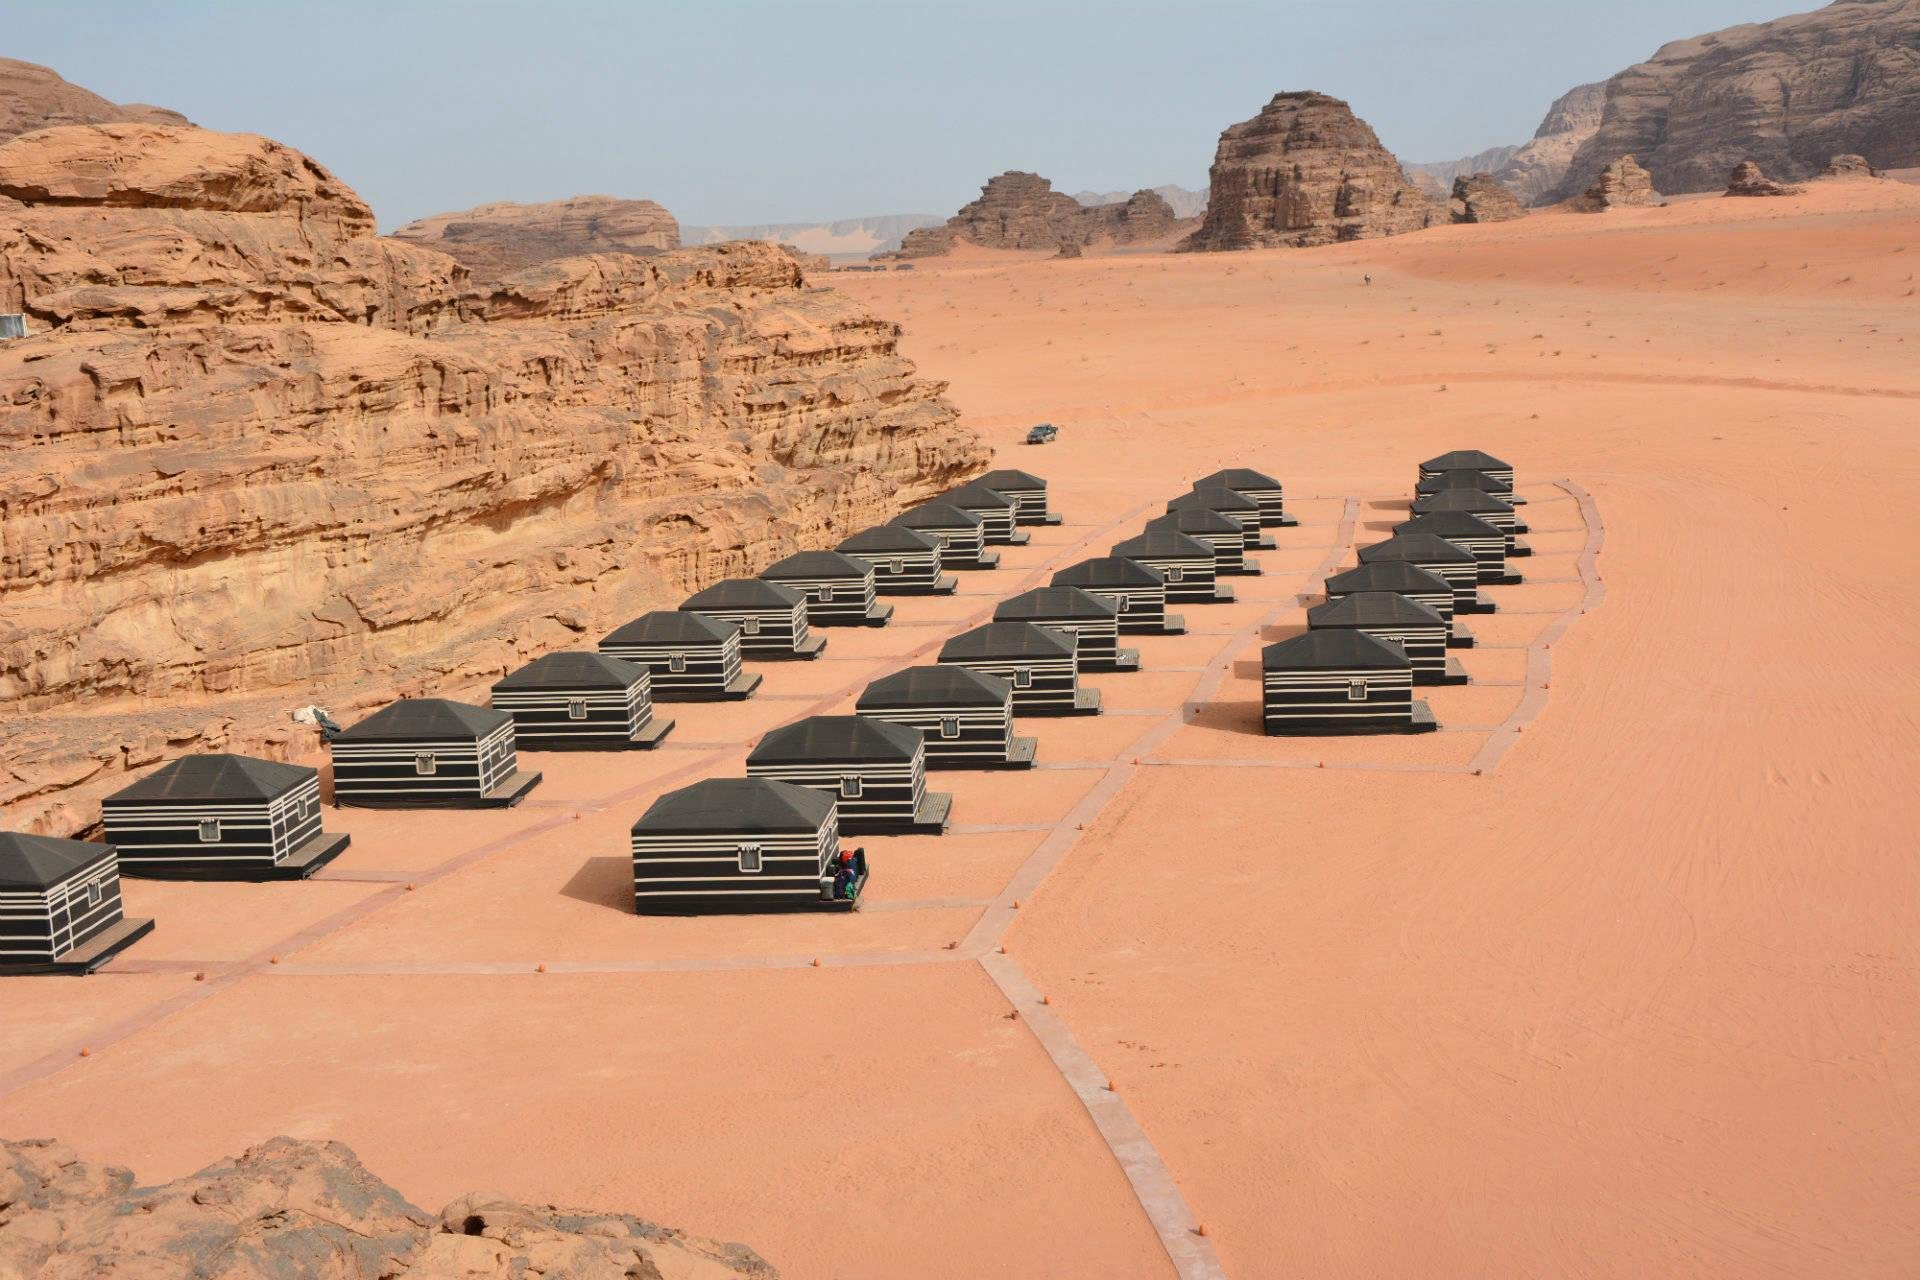 Space Village Camp - Wadi Rum